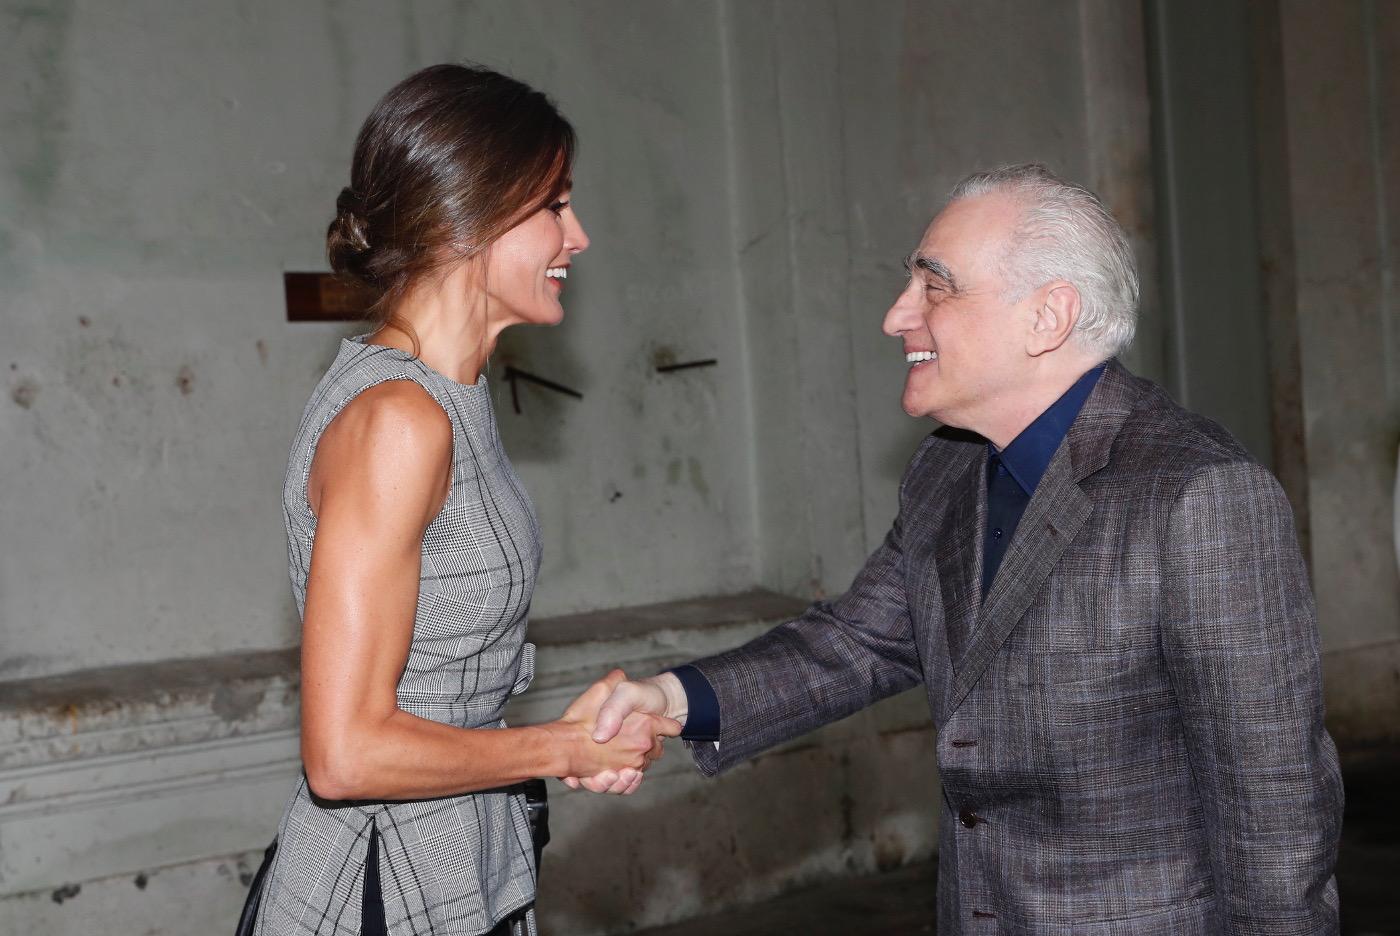 Reina_Scorsese_20181018_01